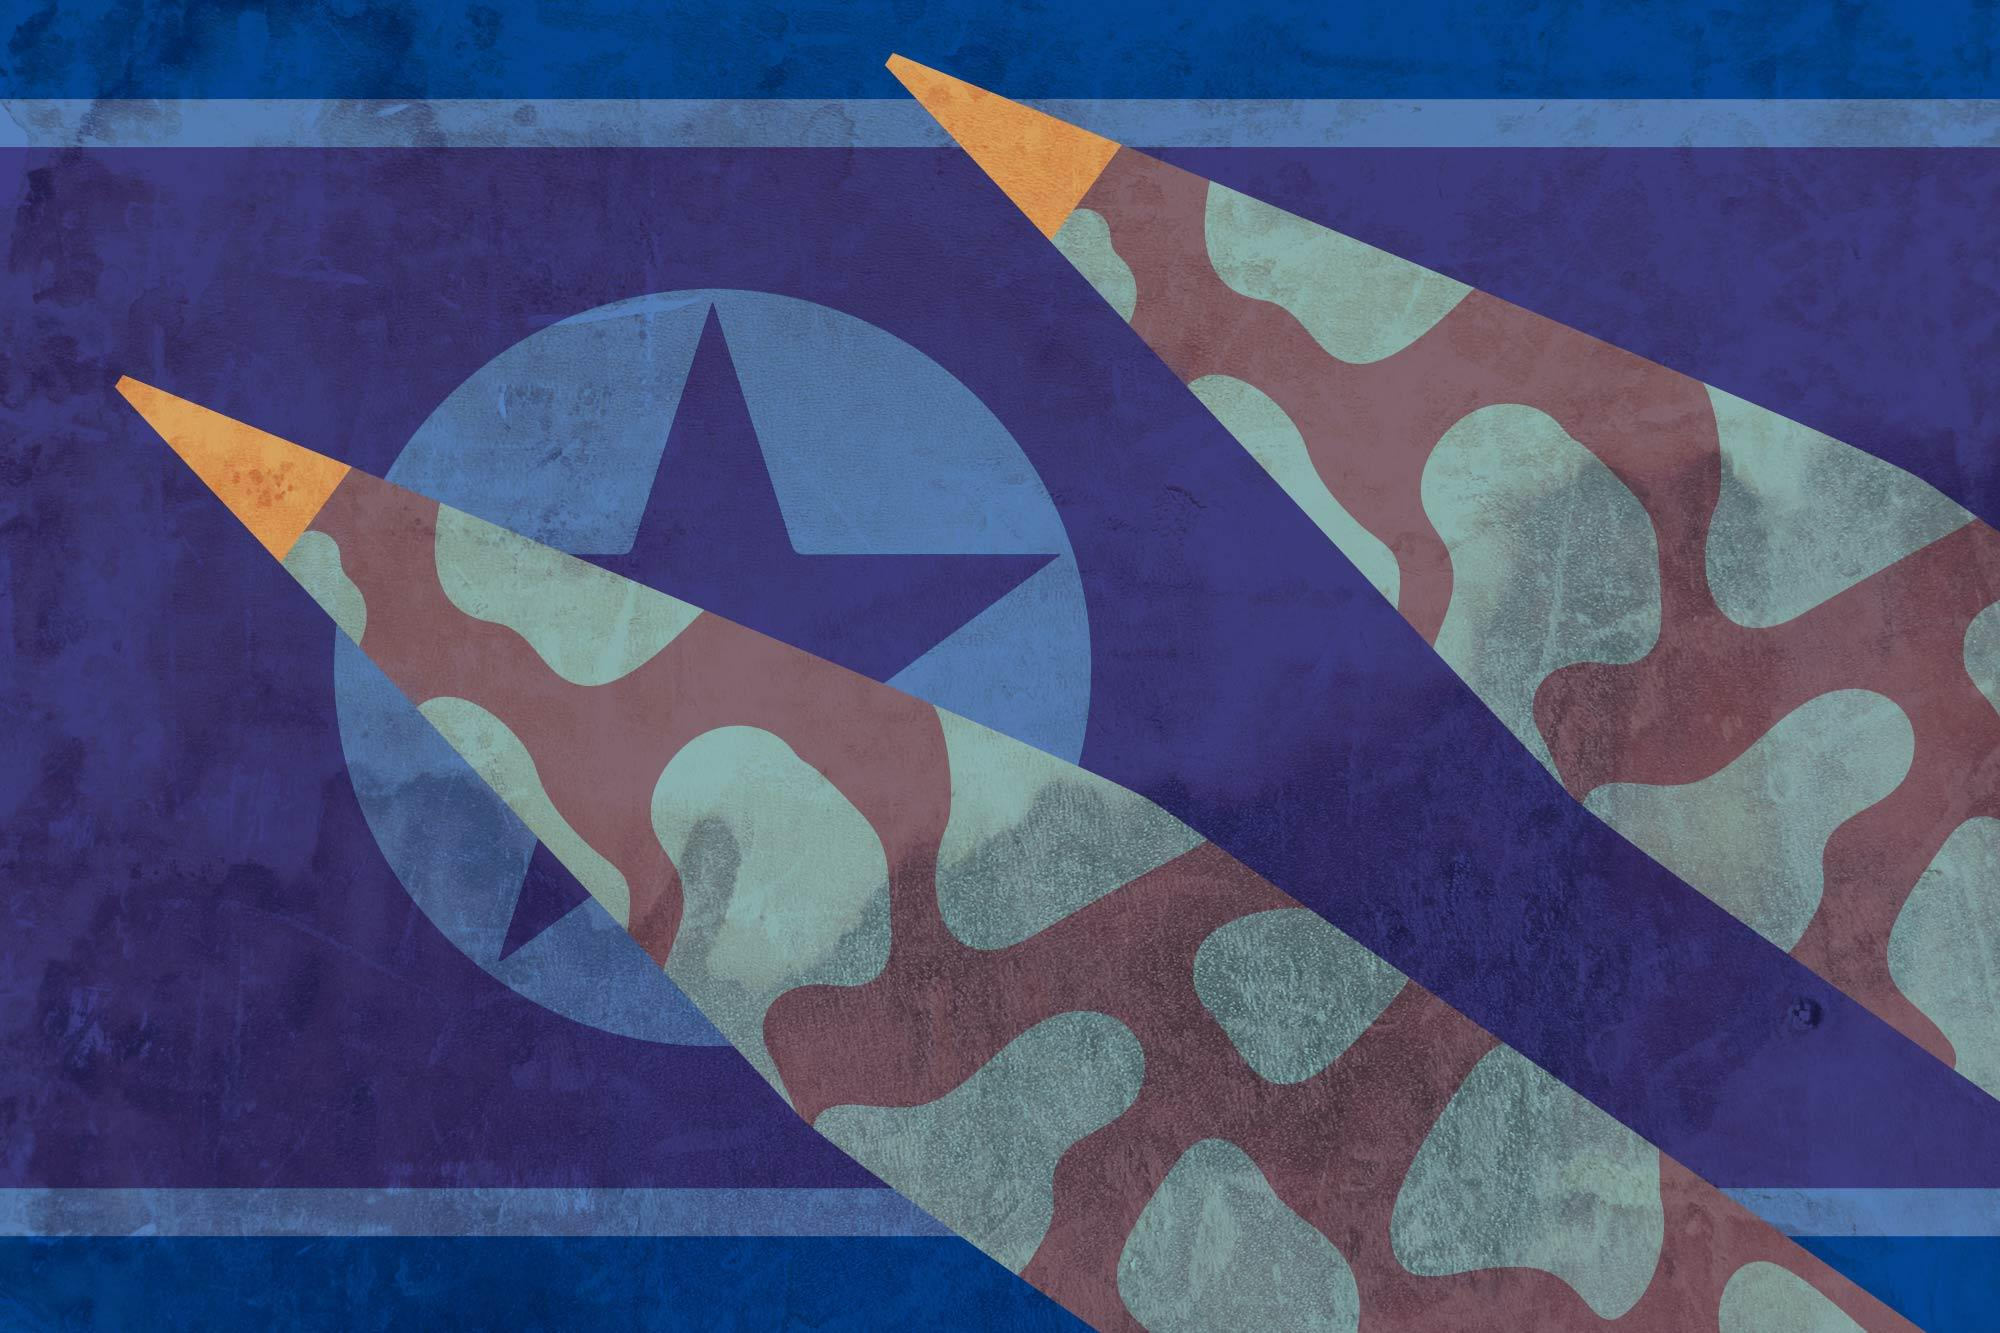 Missile graphic